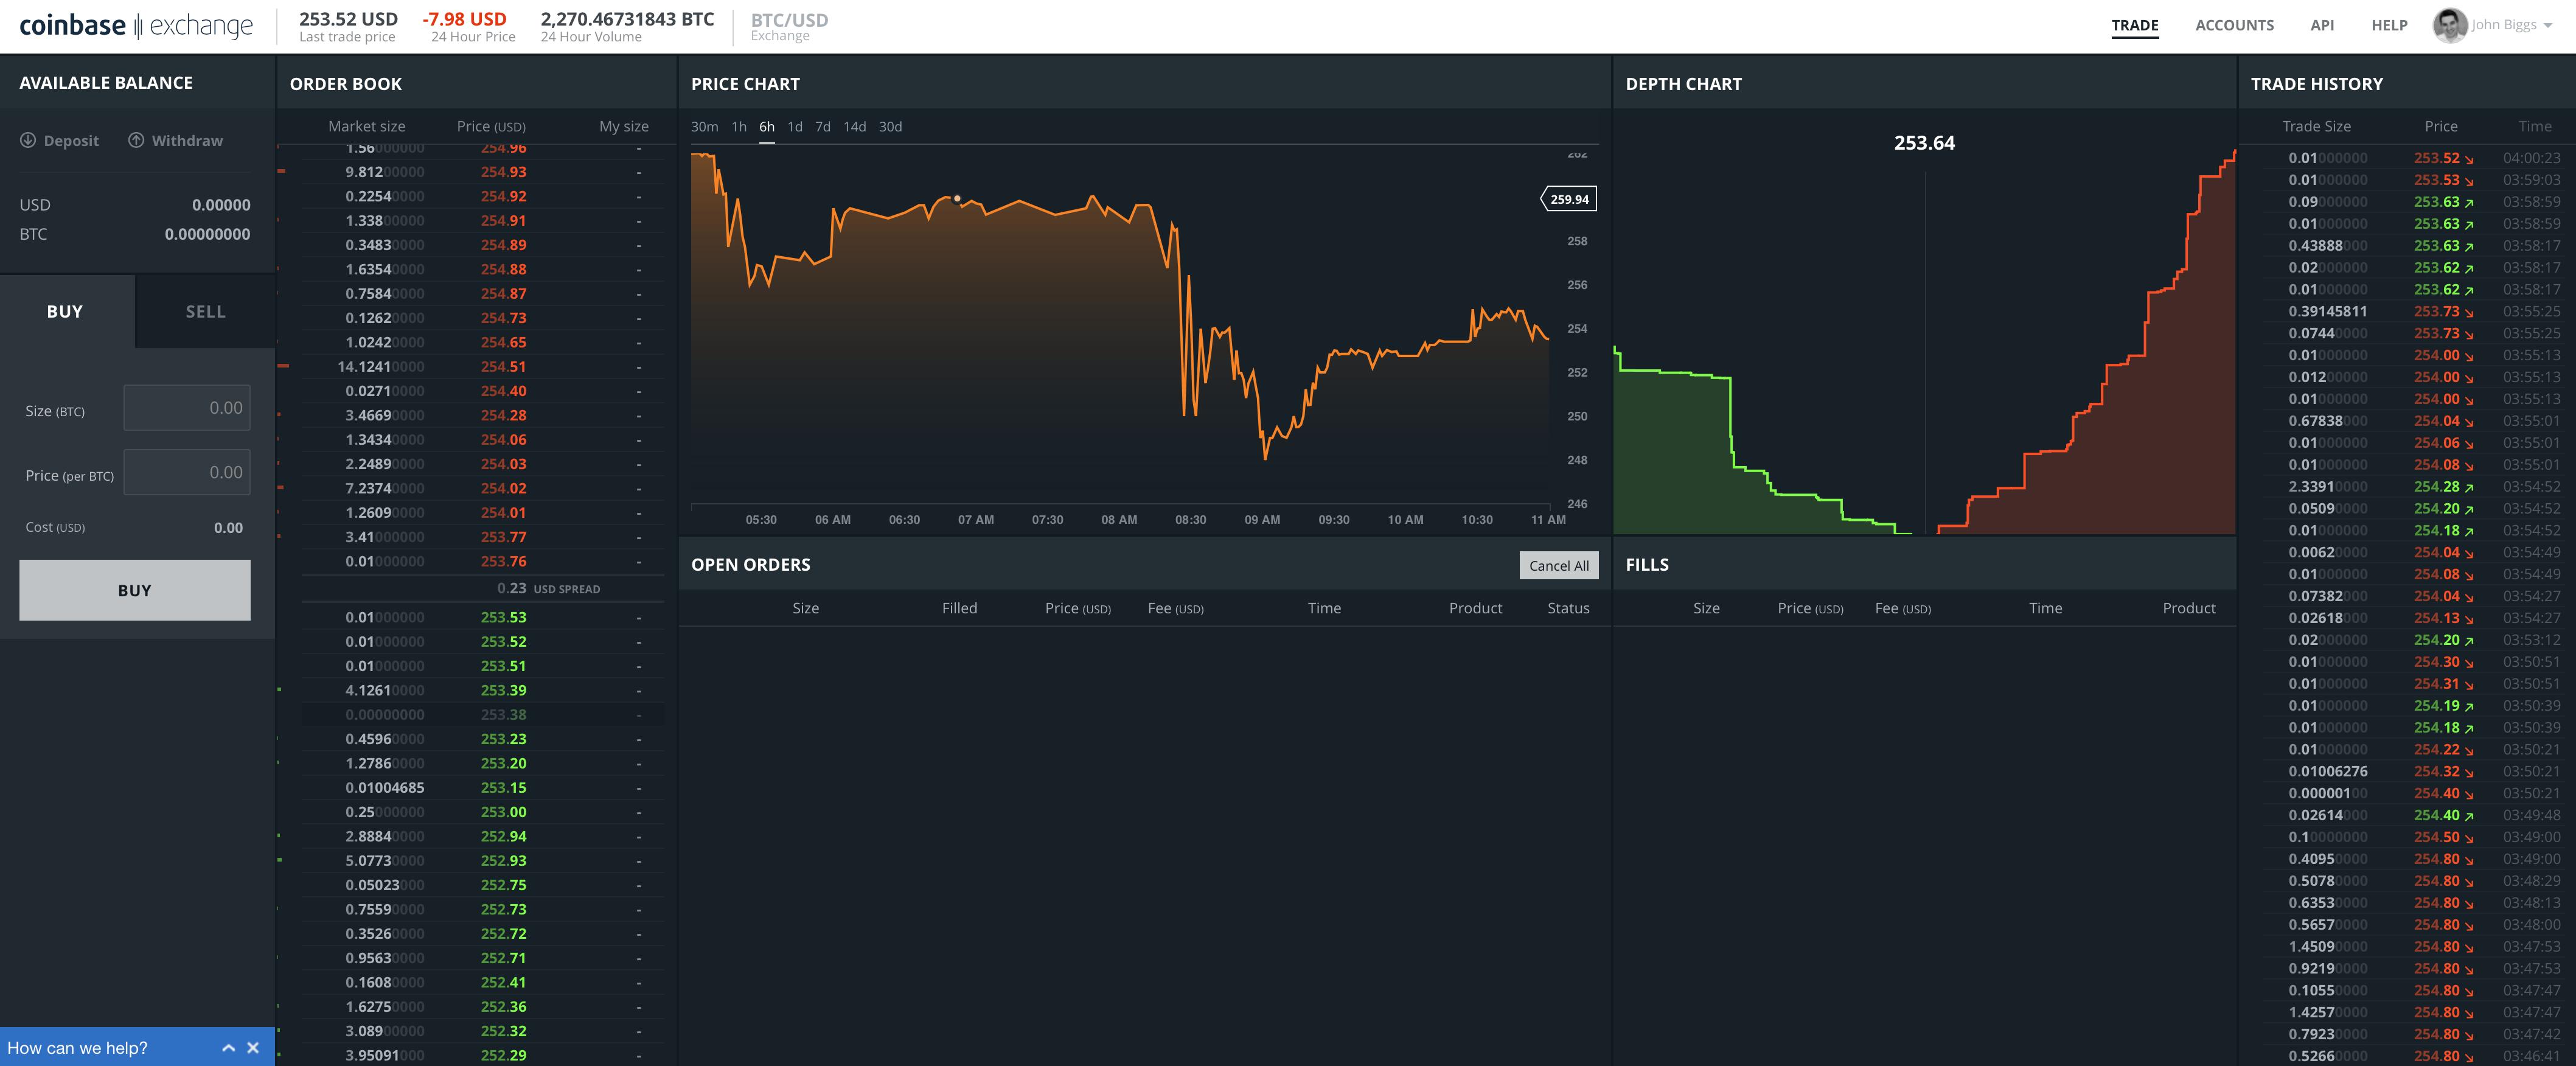 Guida a GDAX (Global Digital Asset Exchange) - Benvenuti su bitcoinpesaroeurbino!